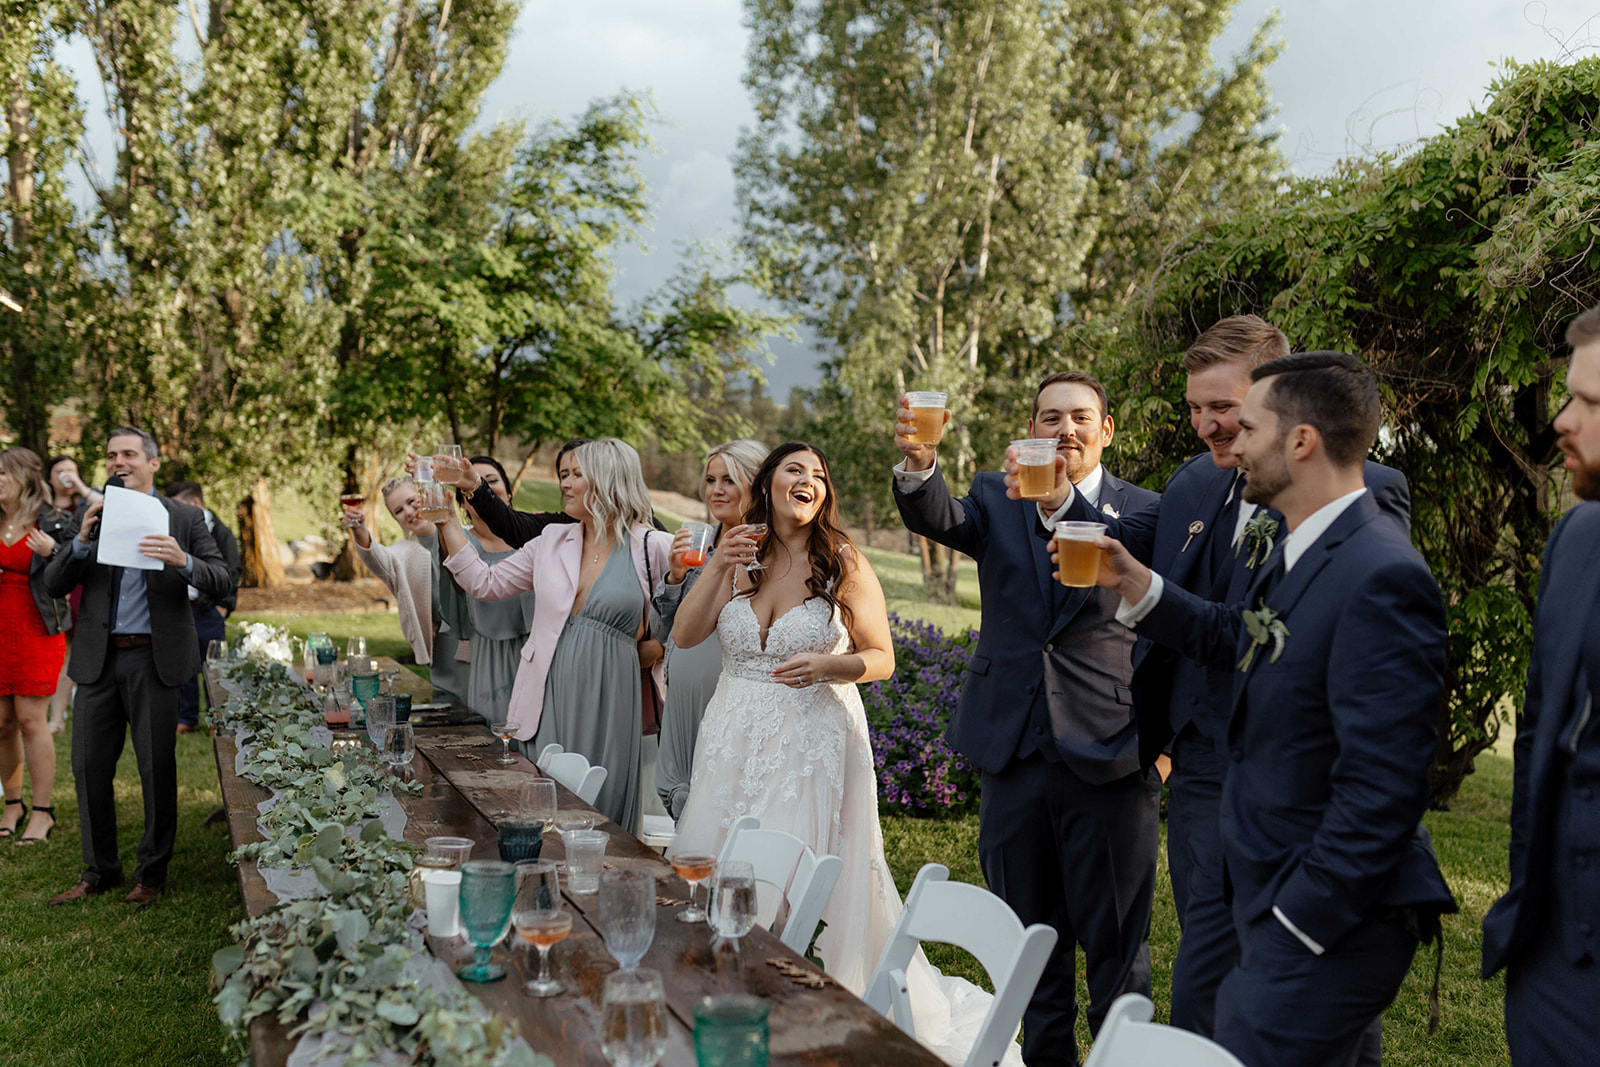 beacon hill wedding honest in ivory dress spokane toasts